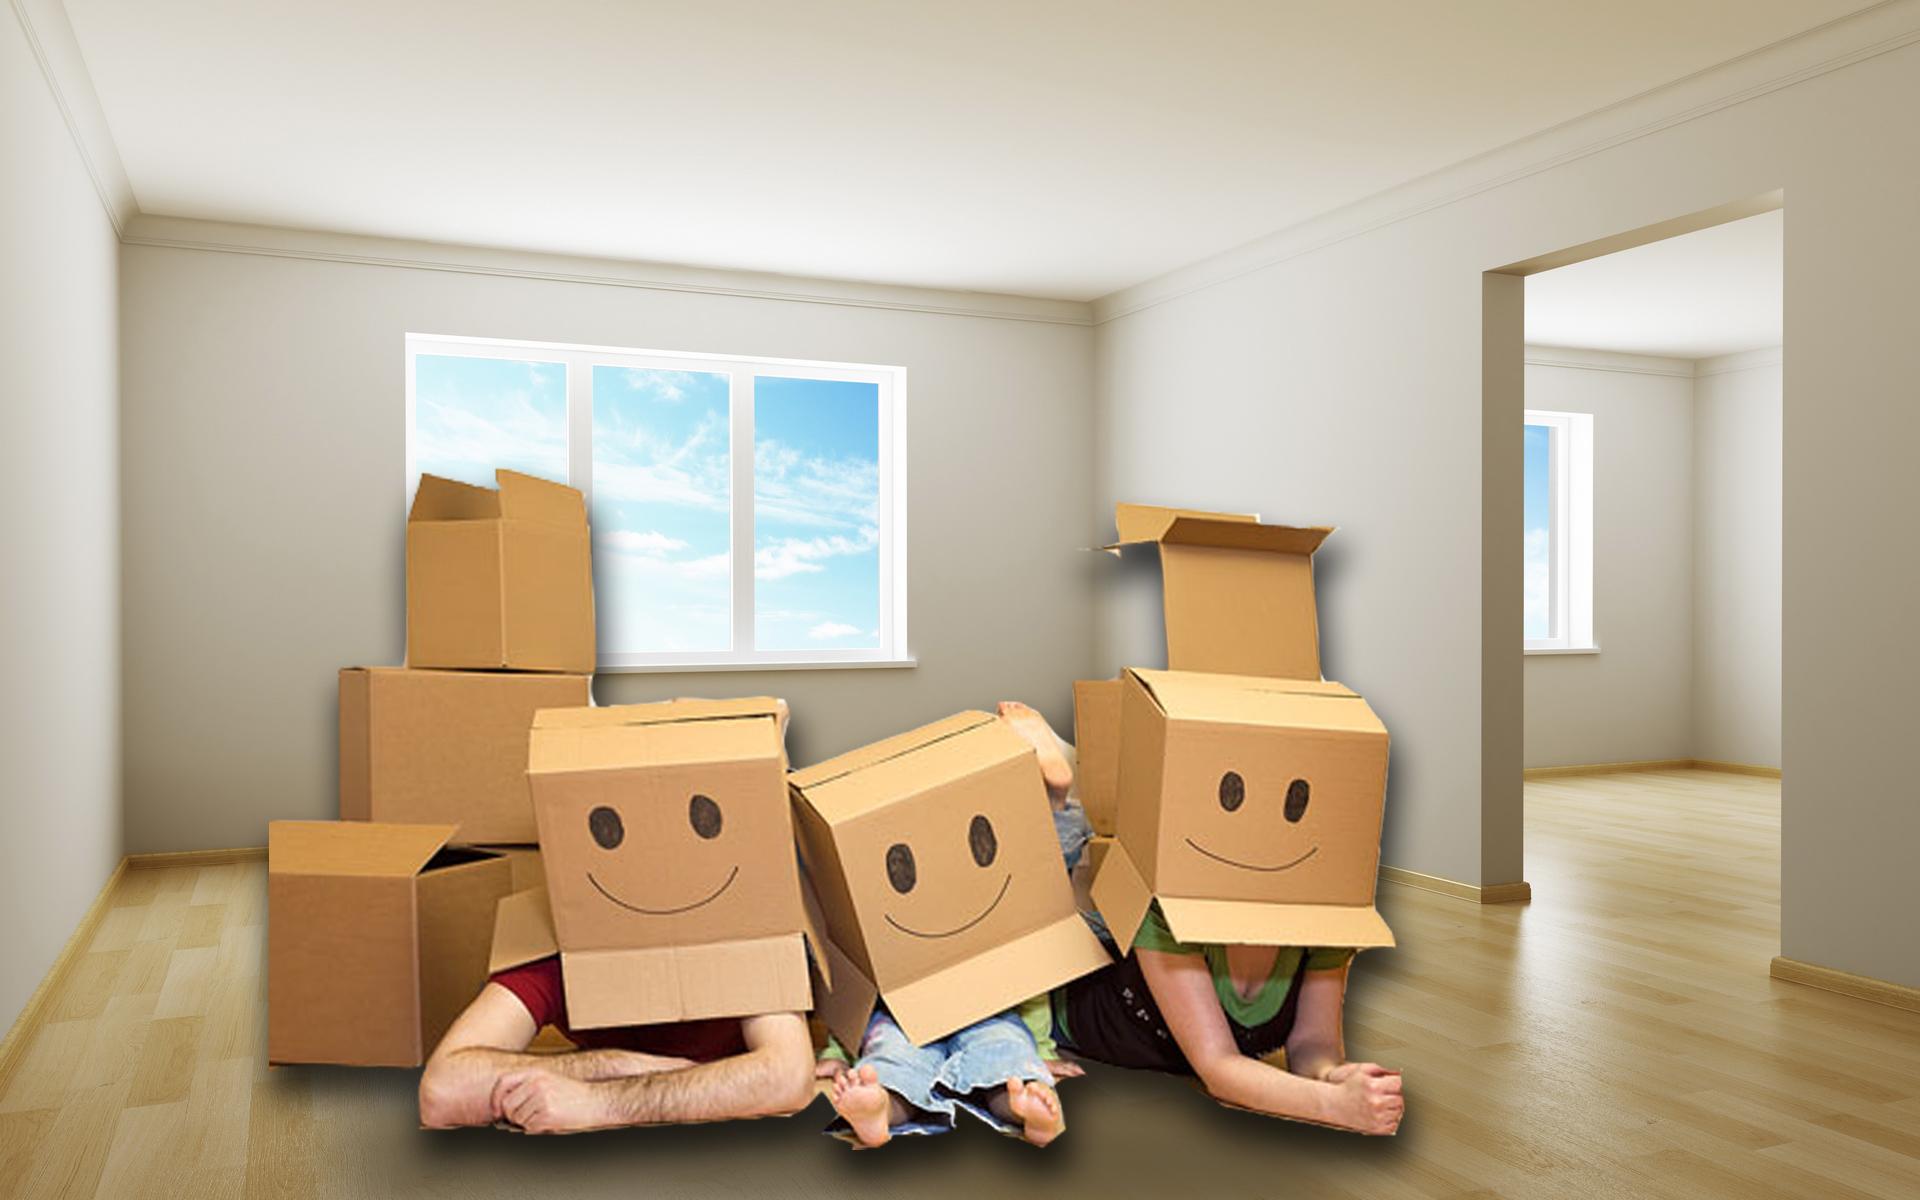 Услуги по квартирному переезду